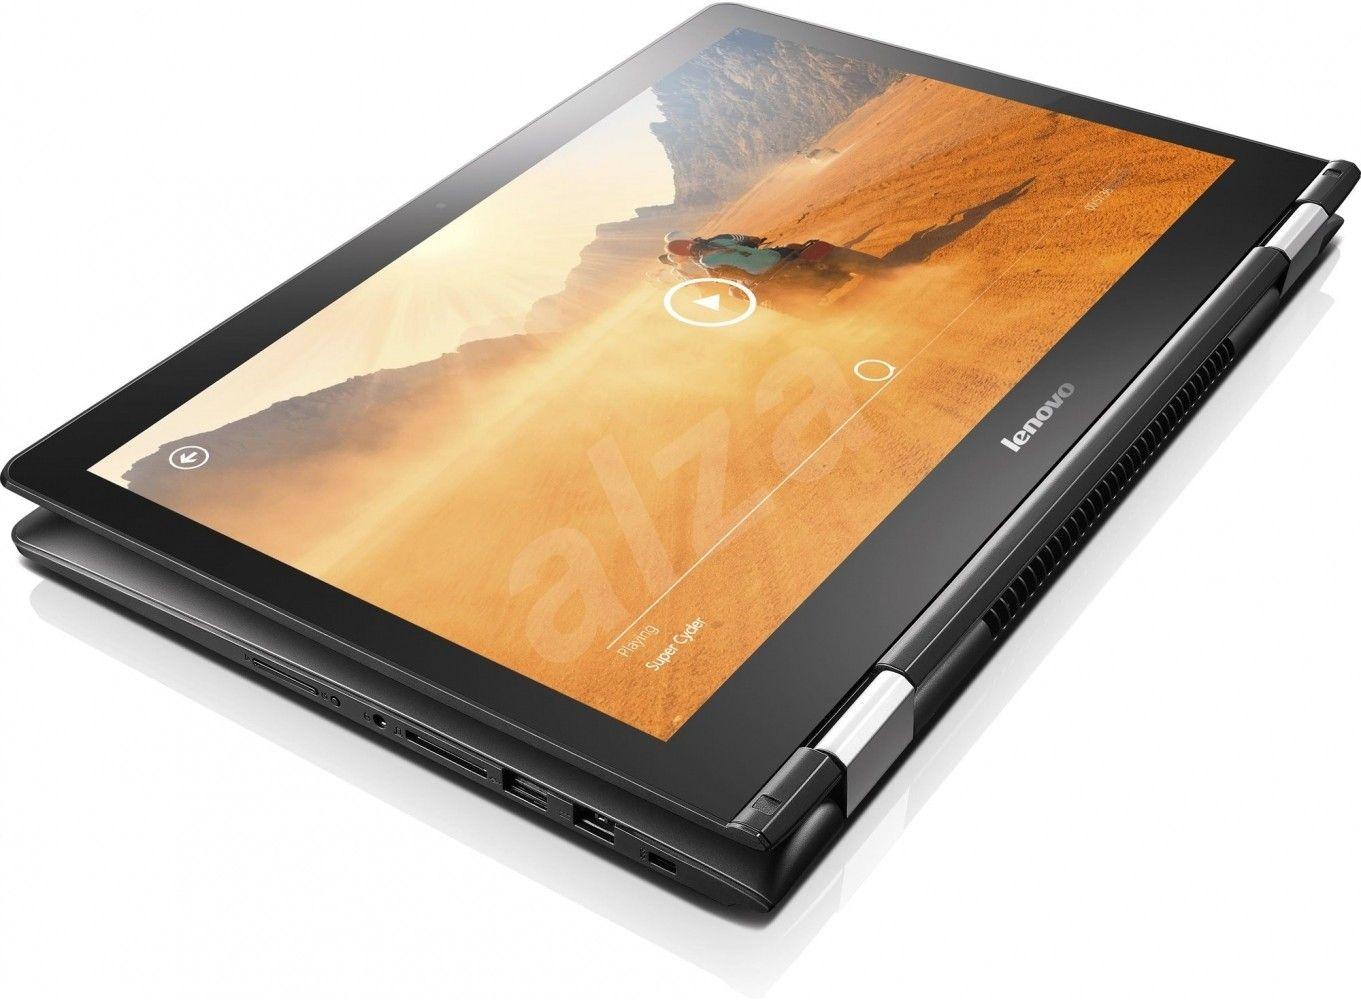 Ноутбук Lenovo Yoga 500-15 (80N600BDUA) Black - 3